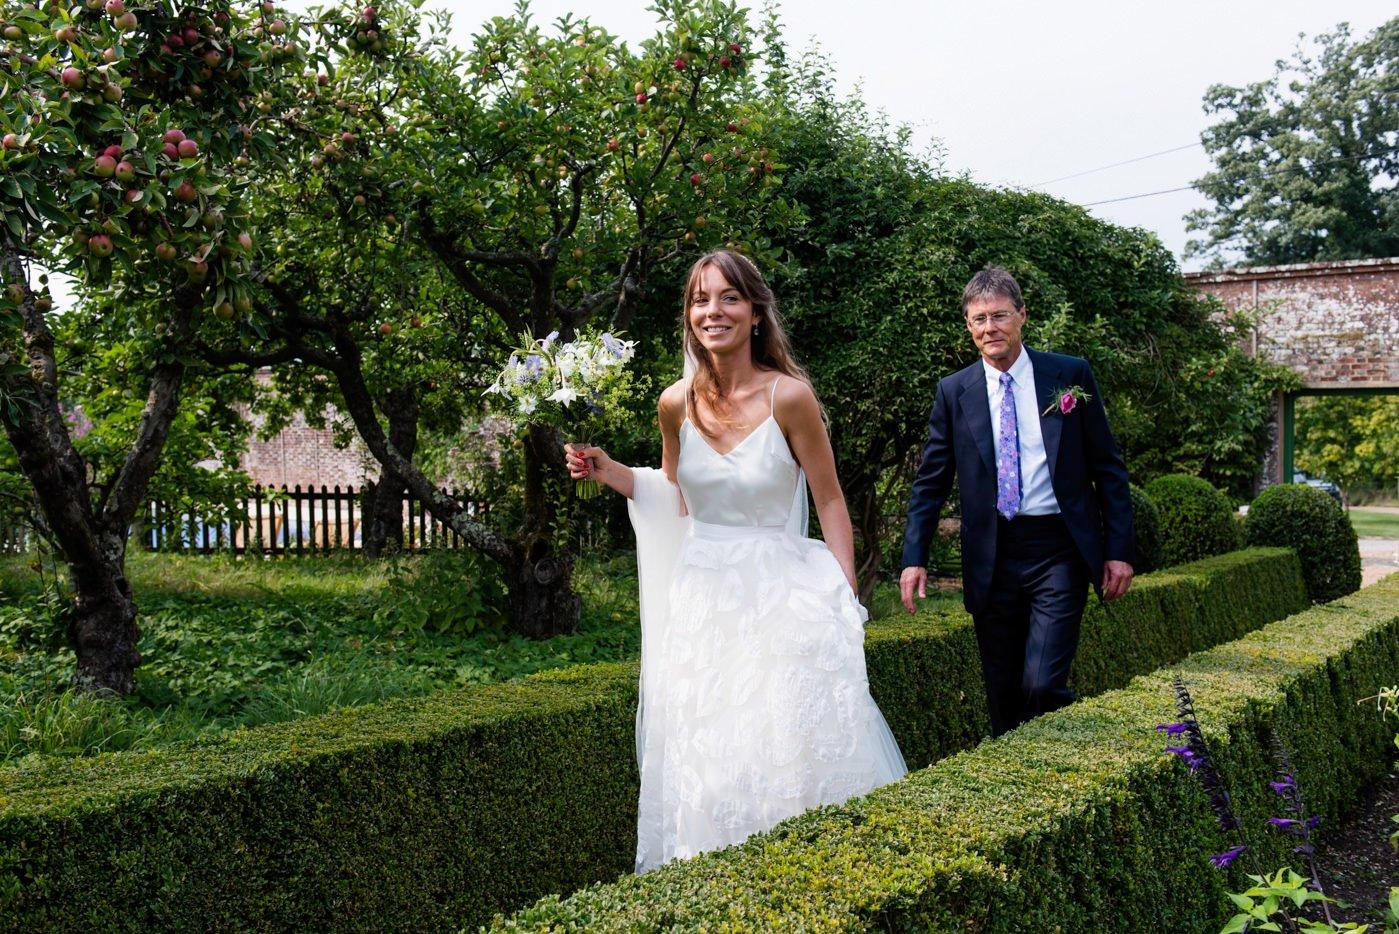 bignor-park-wedding-photography-robyn-and-tom-47